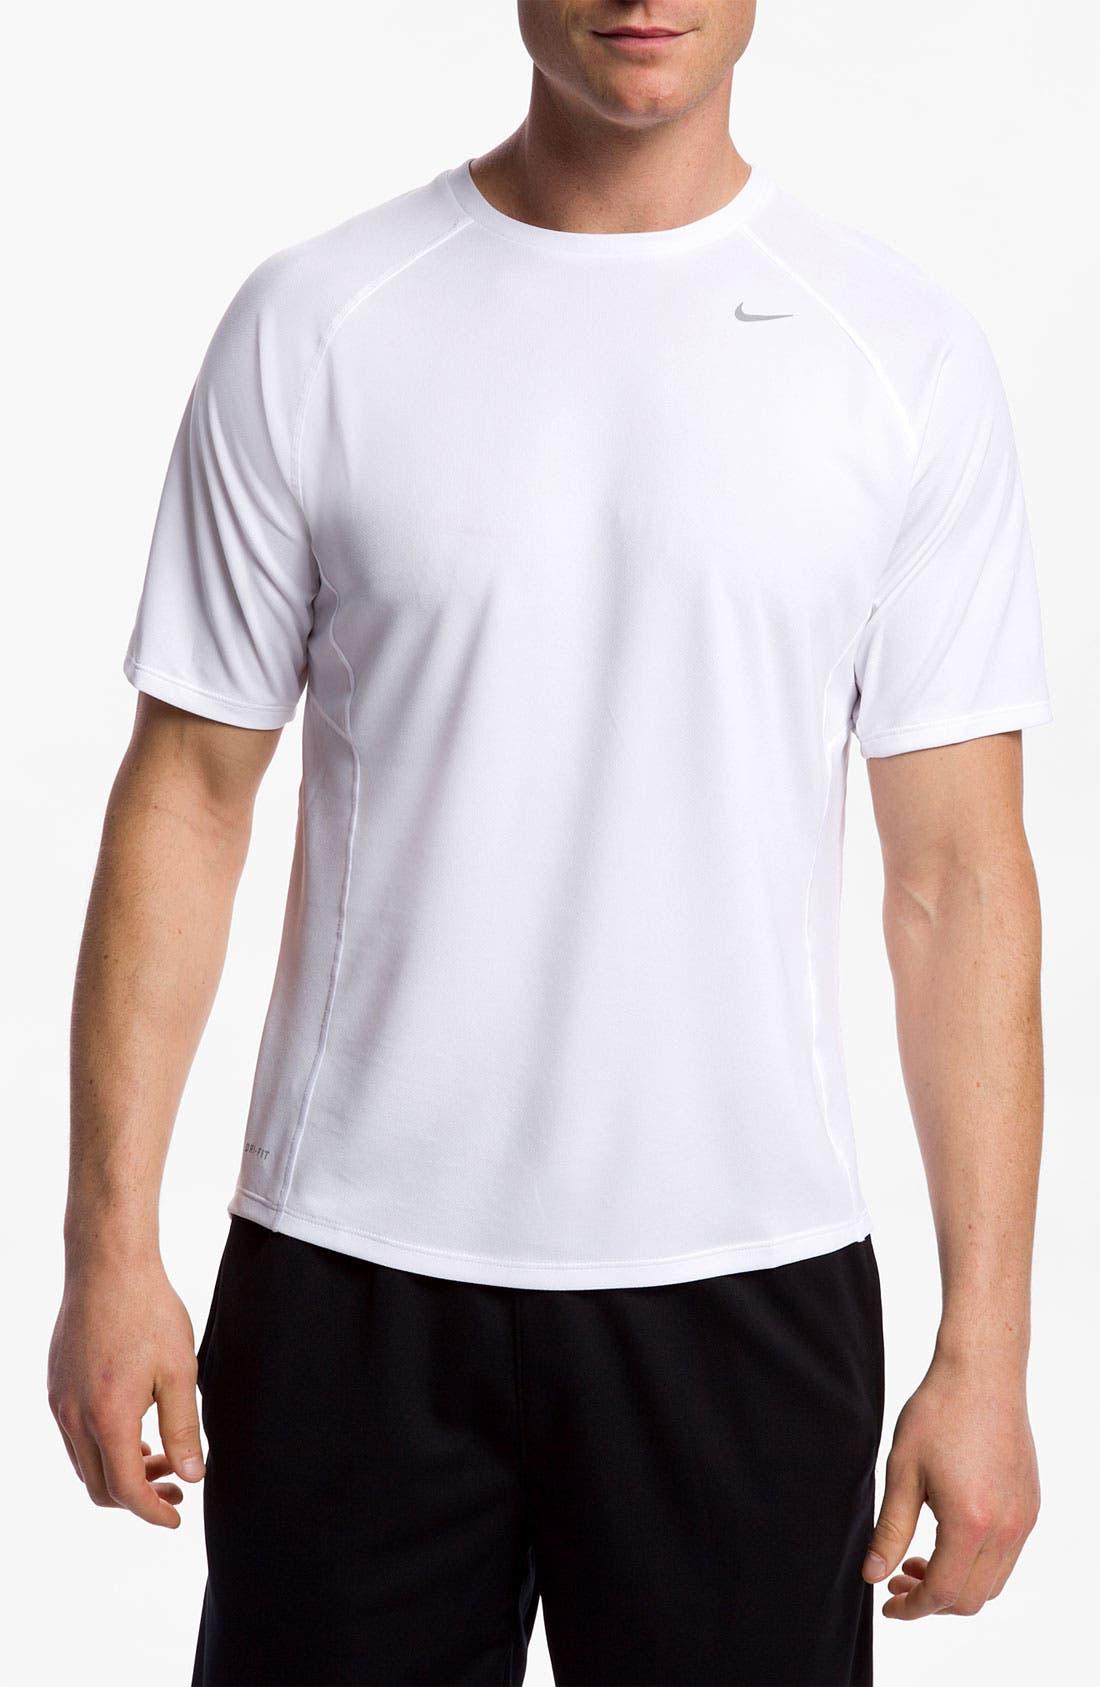 Alternate Image 1 Selected - Nike 'Miler' Dri-FIT UV Protection Short Sleeve T-Shirt